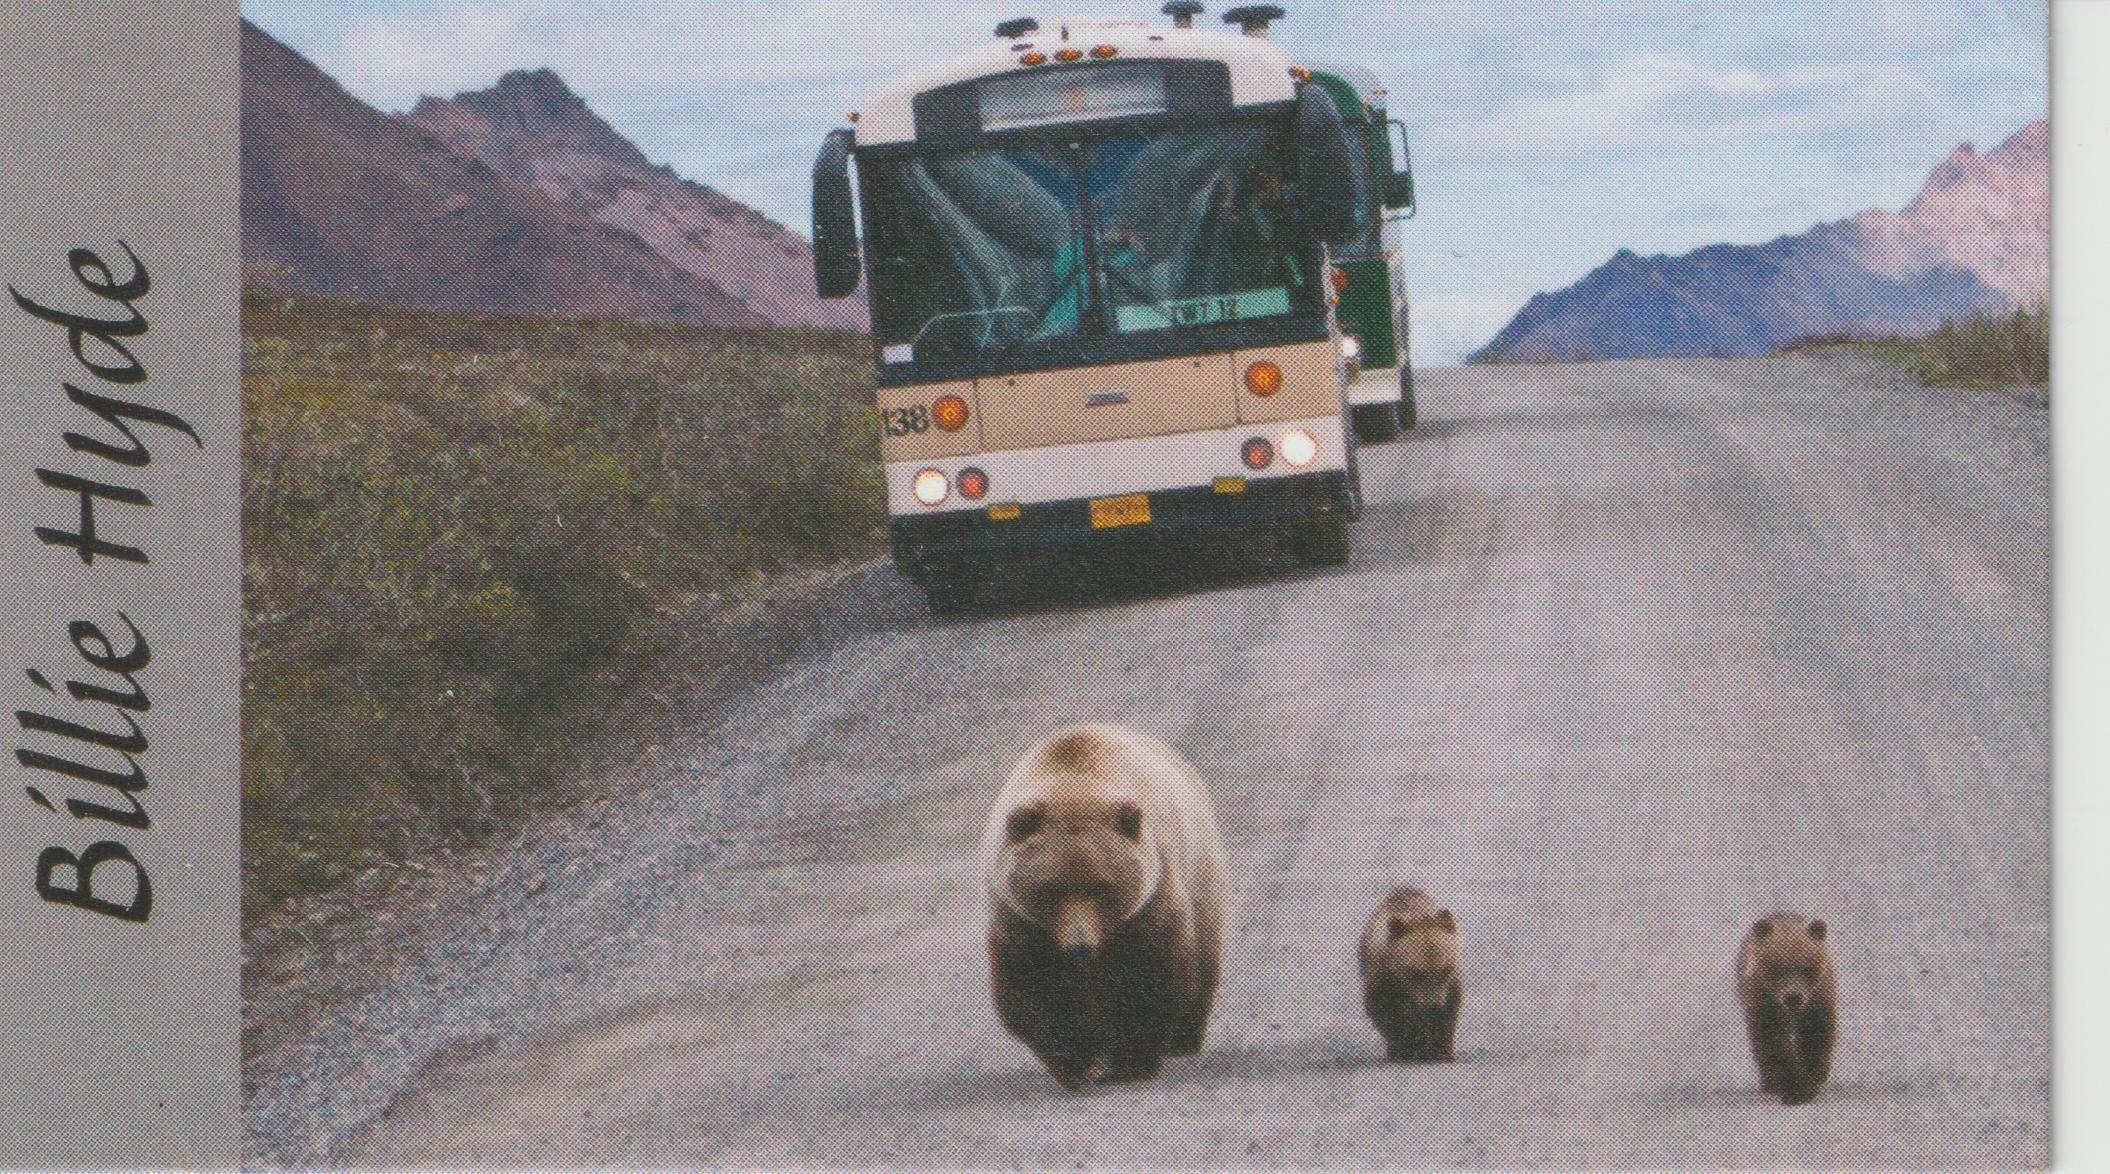 Bears and bus, Denali